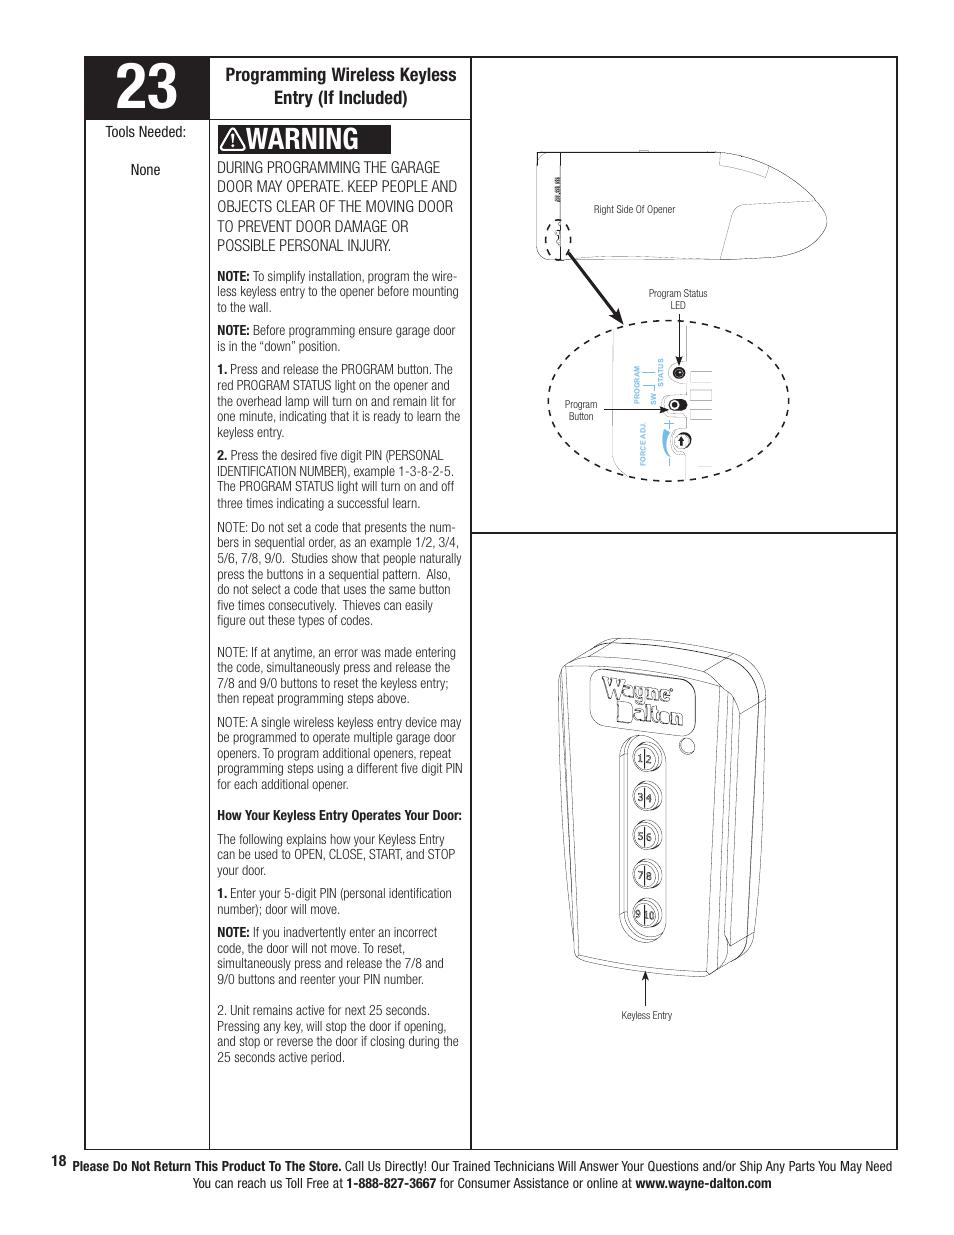 medium resolution of warning programming wireless keyless entry if included wayne dalton prodrive 3222c z user manual page 24 48